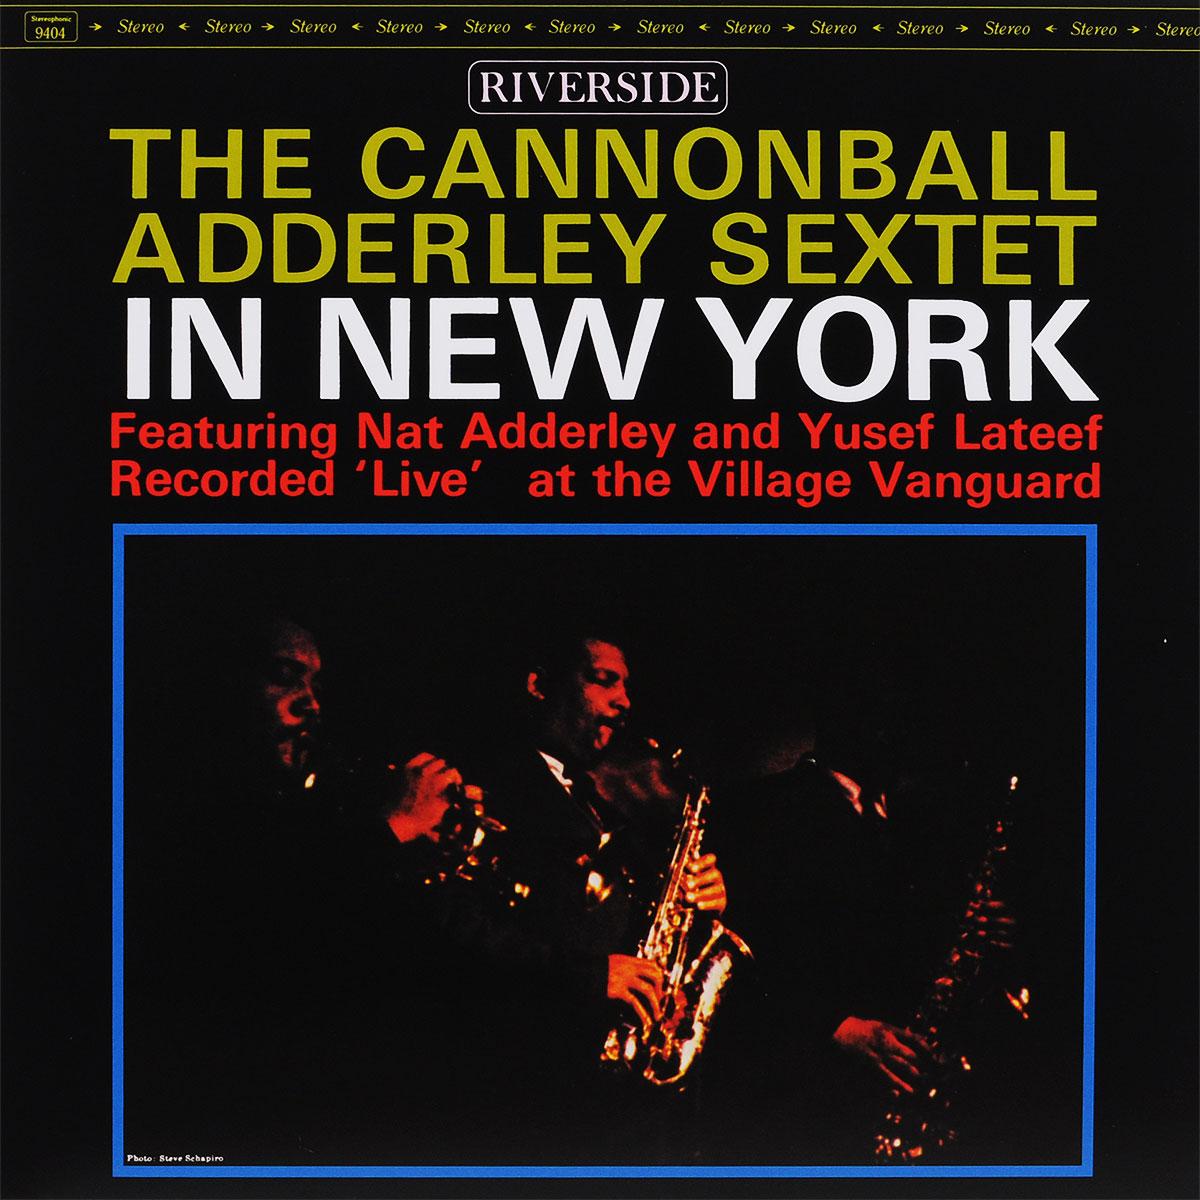 Кэннонболл Эдерли The Cannonball Adderley. In New York (LP) кэннонболл эдерли милт джексон cannonball adderley with milt jackson things are getting better lp